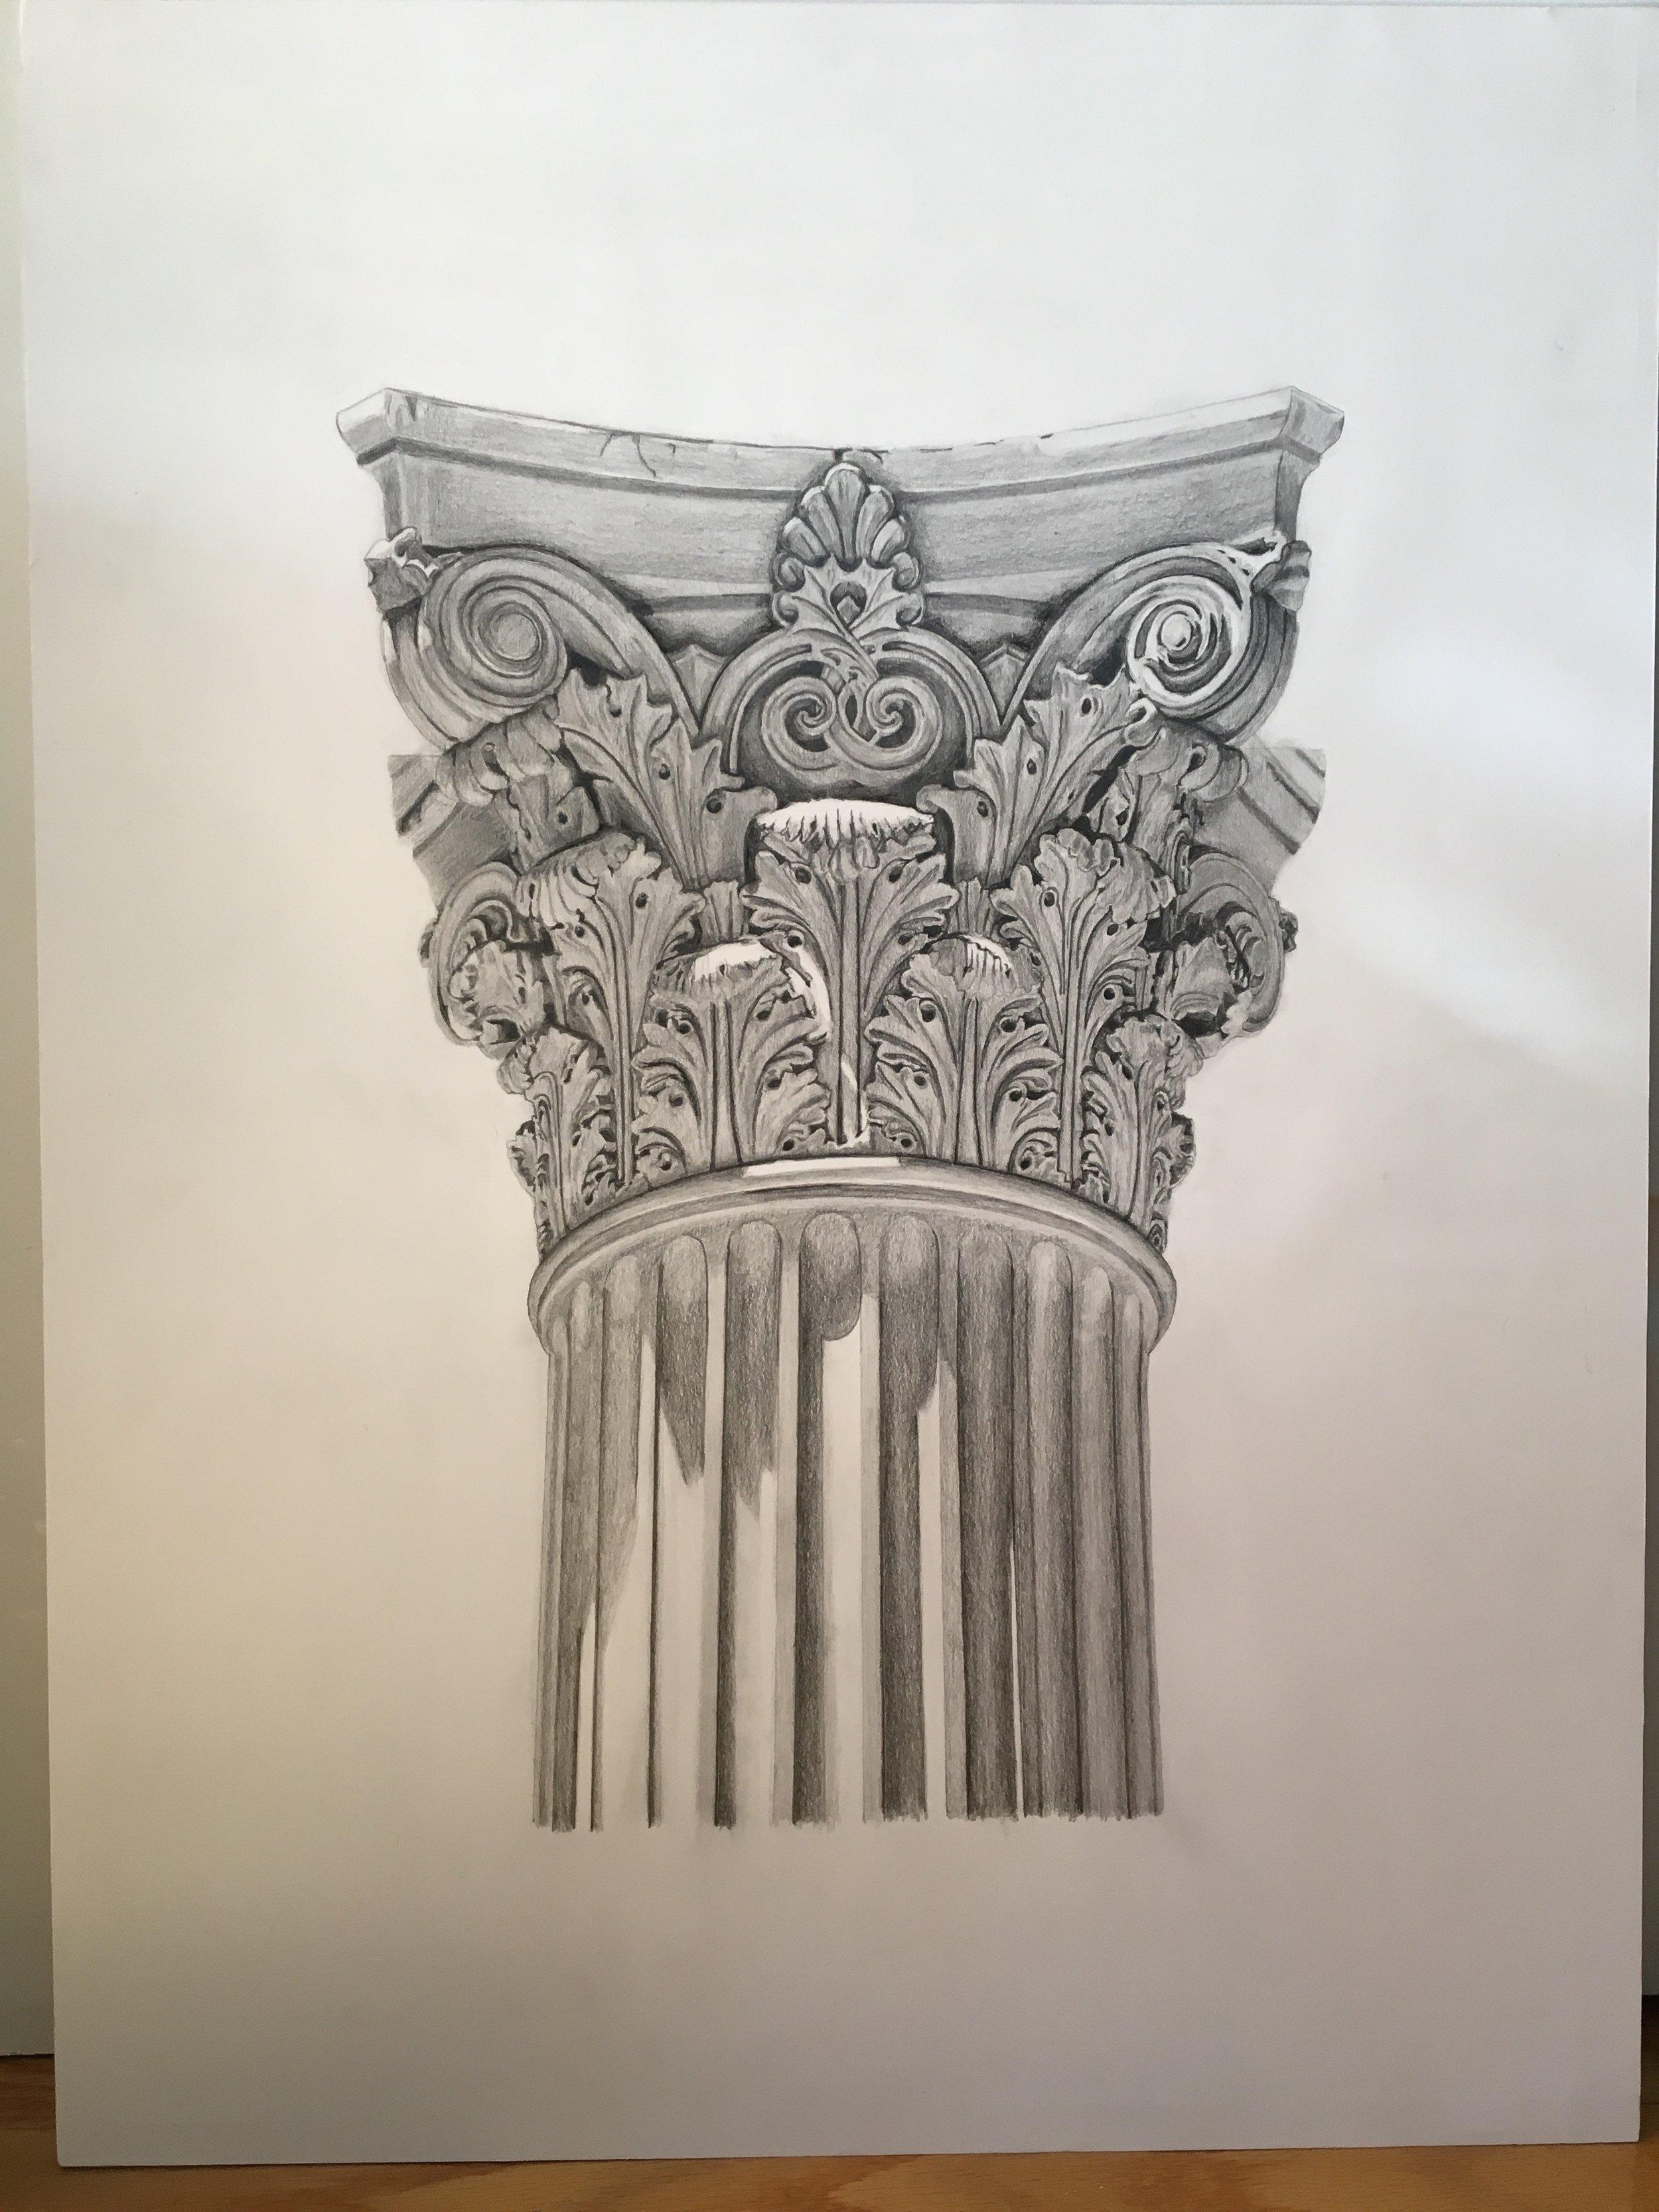 "Corinthian capital<br>Pencil on paper mounted on 18"" x 24"" masonite"